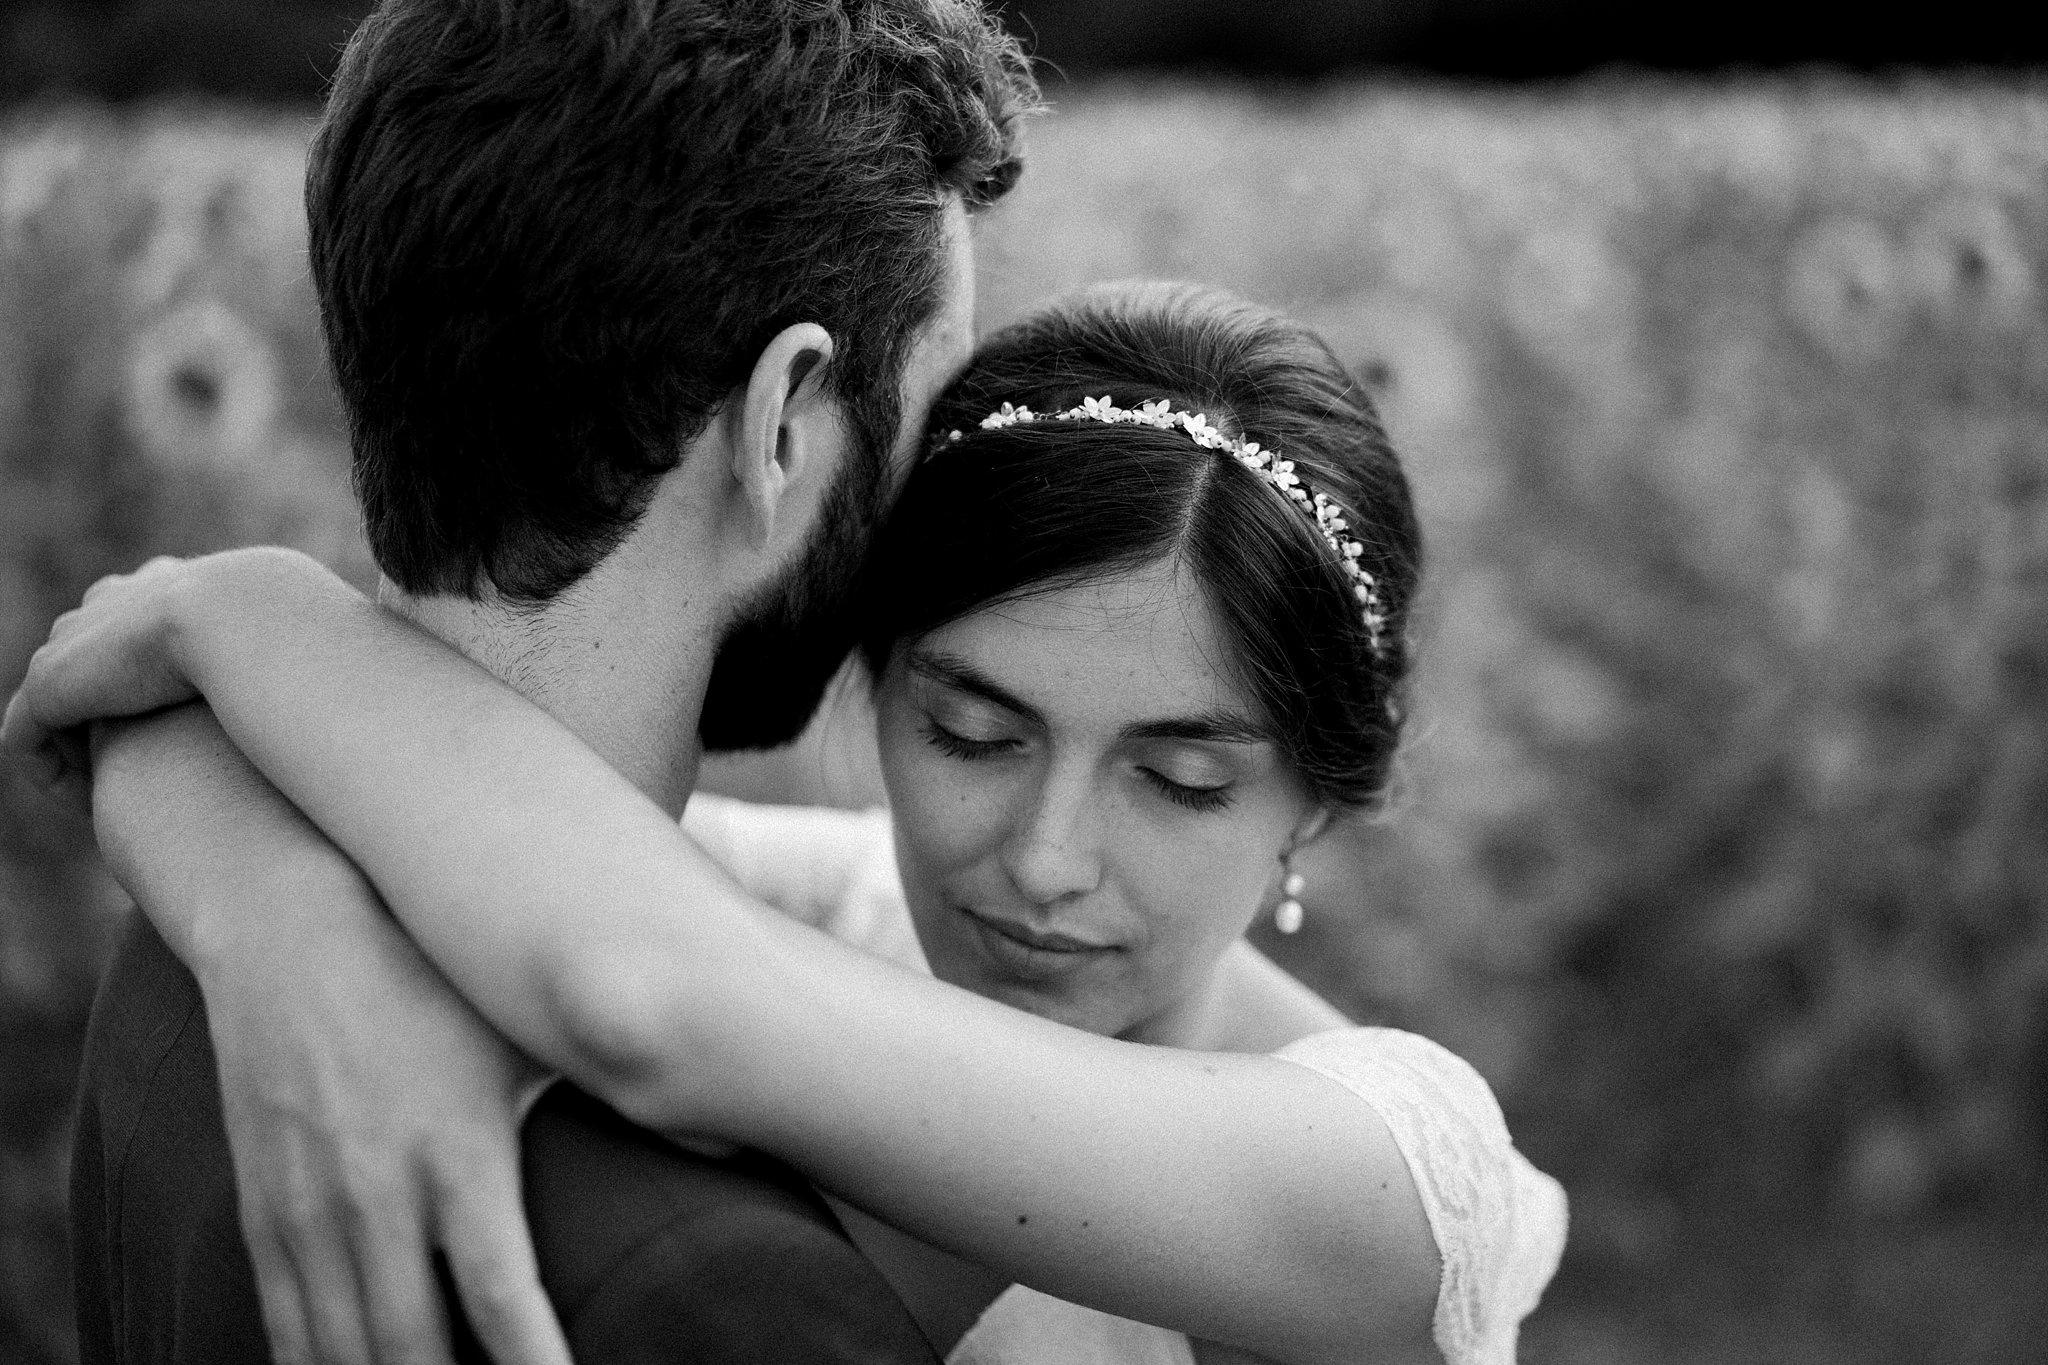 Mariage-a-la-maison-secall-hugo-hennequin-photographe-mariage-perpignan_0098.jpg